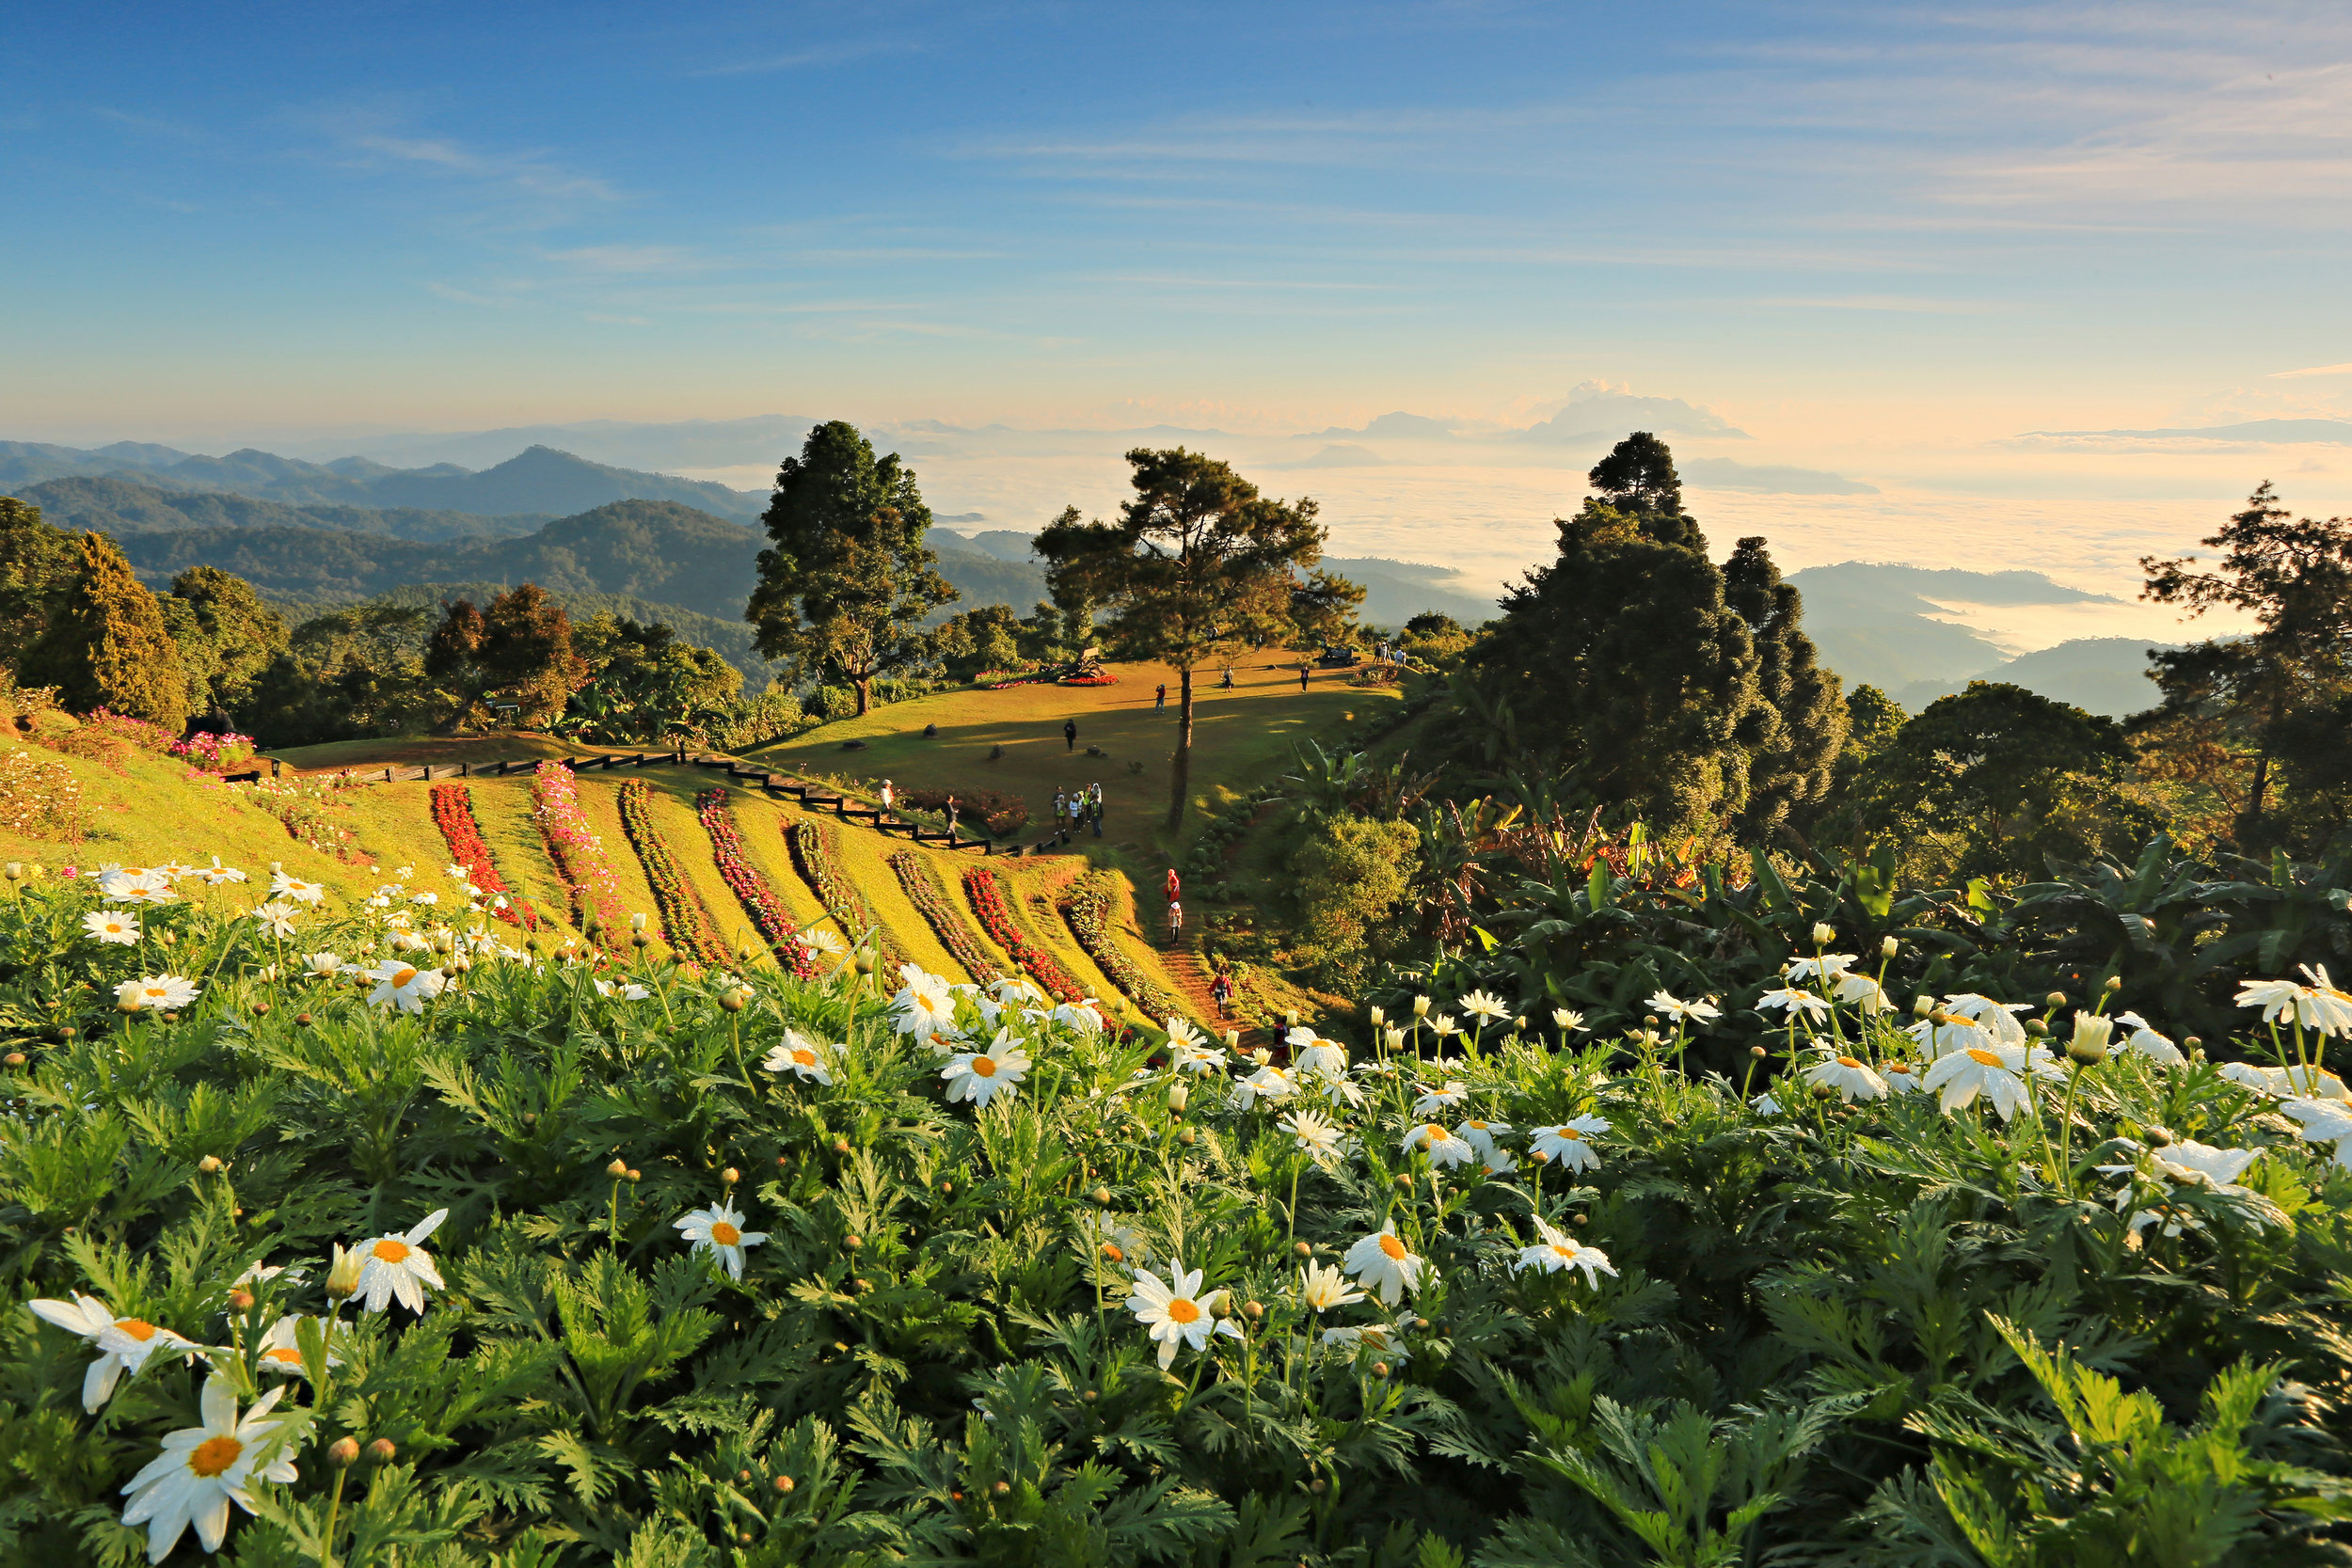 Huay_Nam_Dung_National_Park_Chiang_Mai_Thailand.jpg